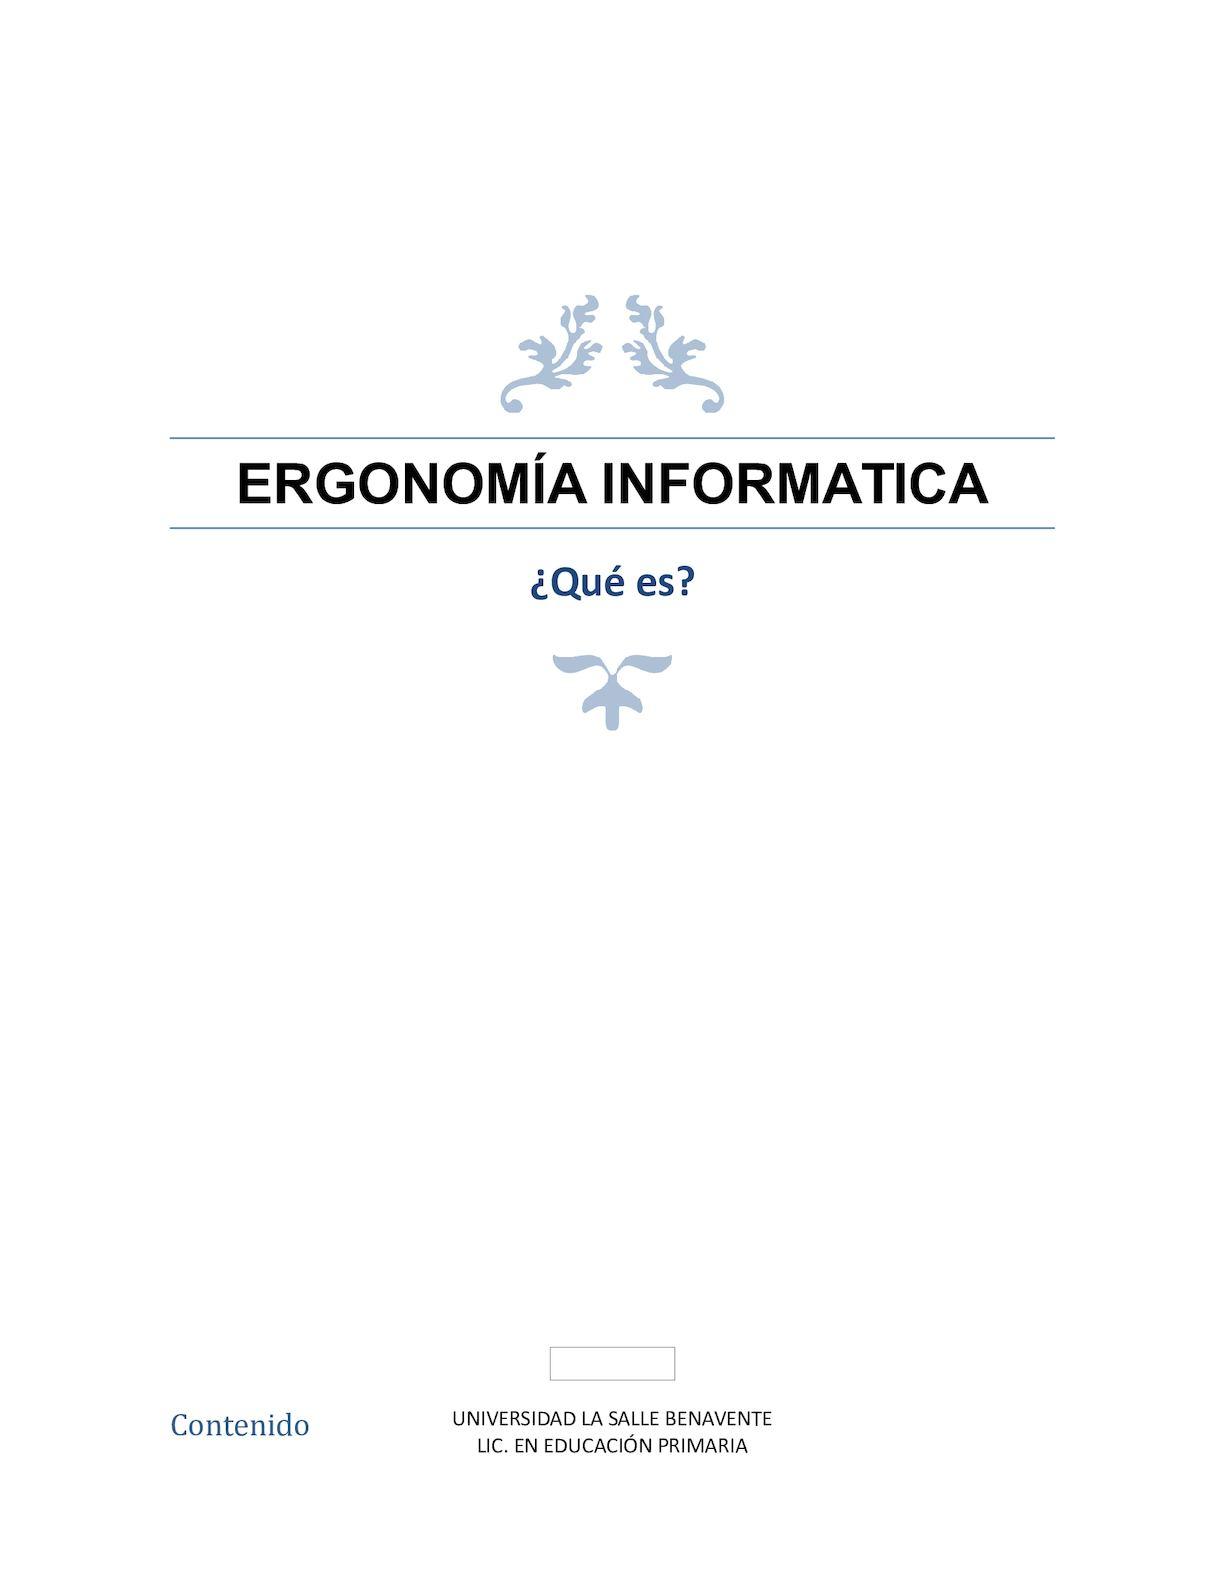 Ergonomia Informatica